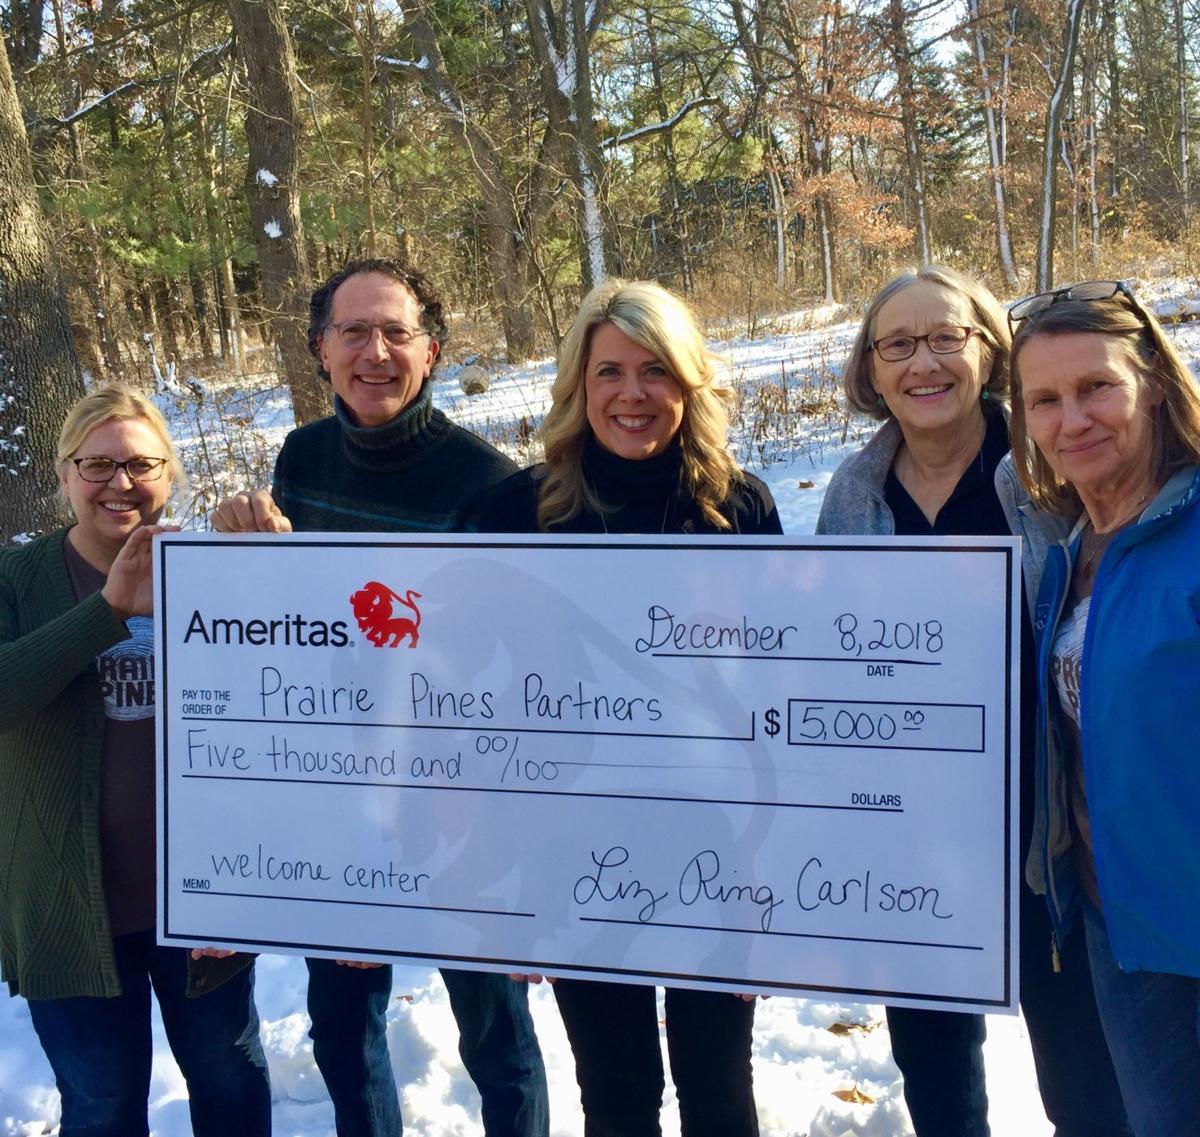 Ameritas donation to Prairie Pines